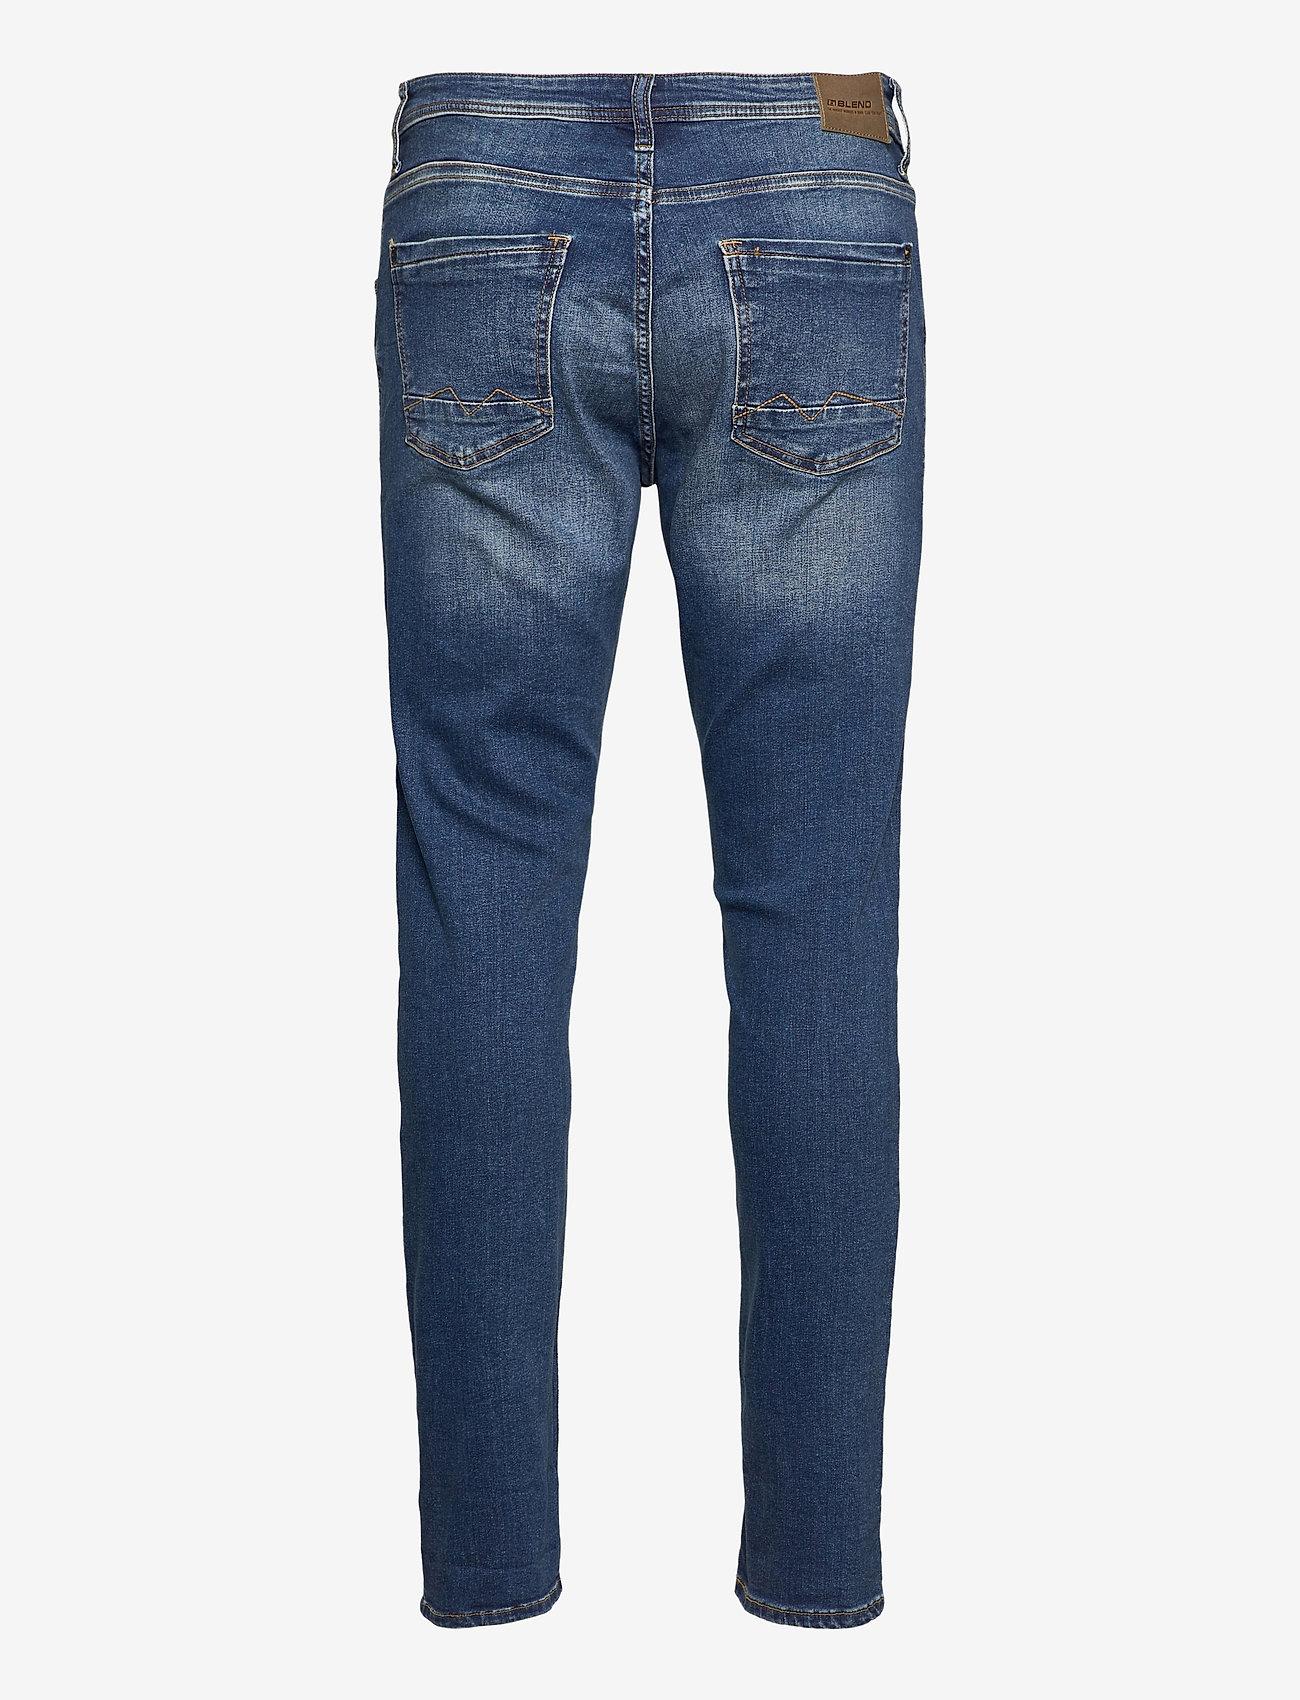 Blend Jeans Multiflex - Jeans DENIM MIDDLE BLUE - Menn Klær